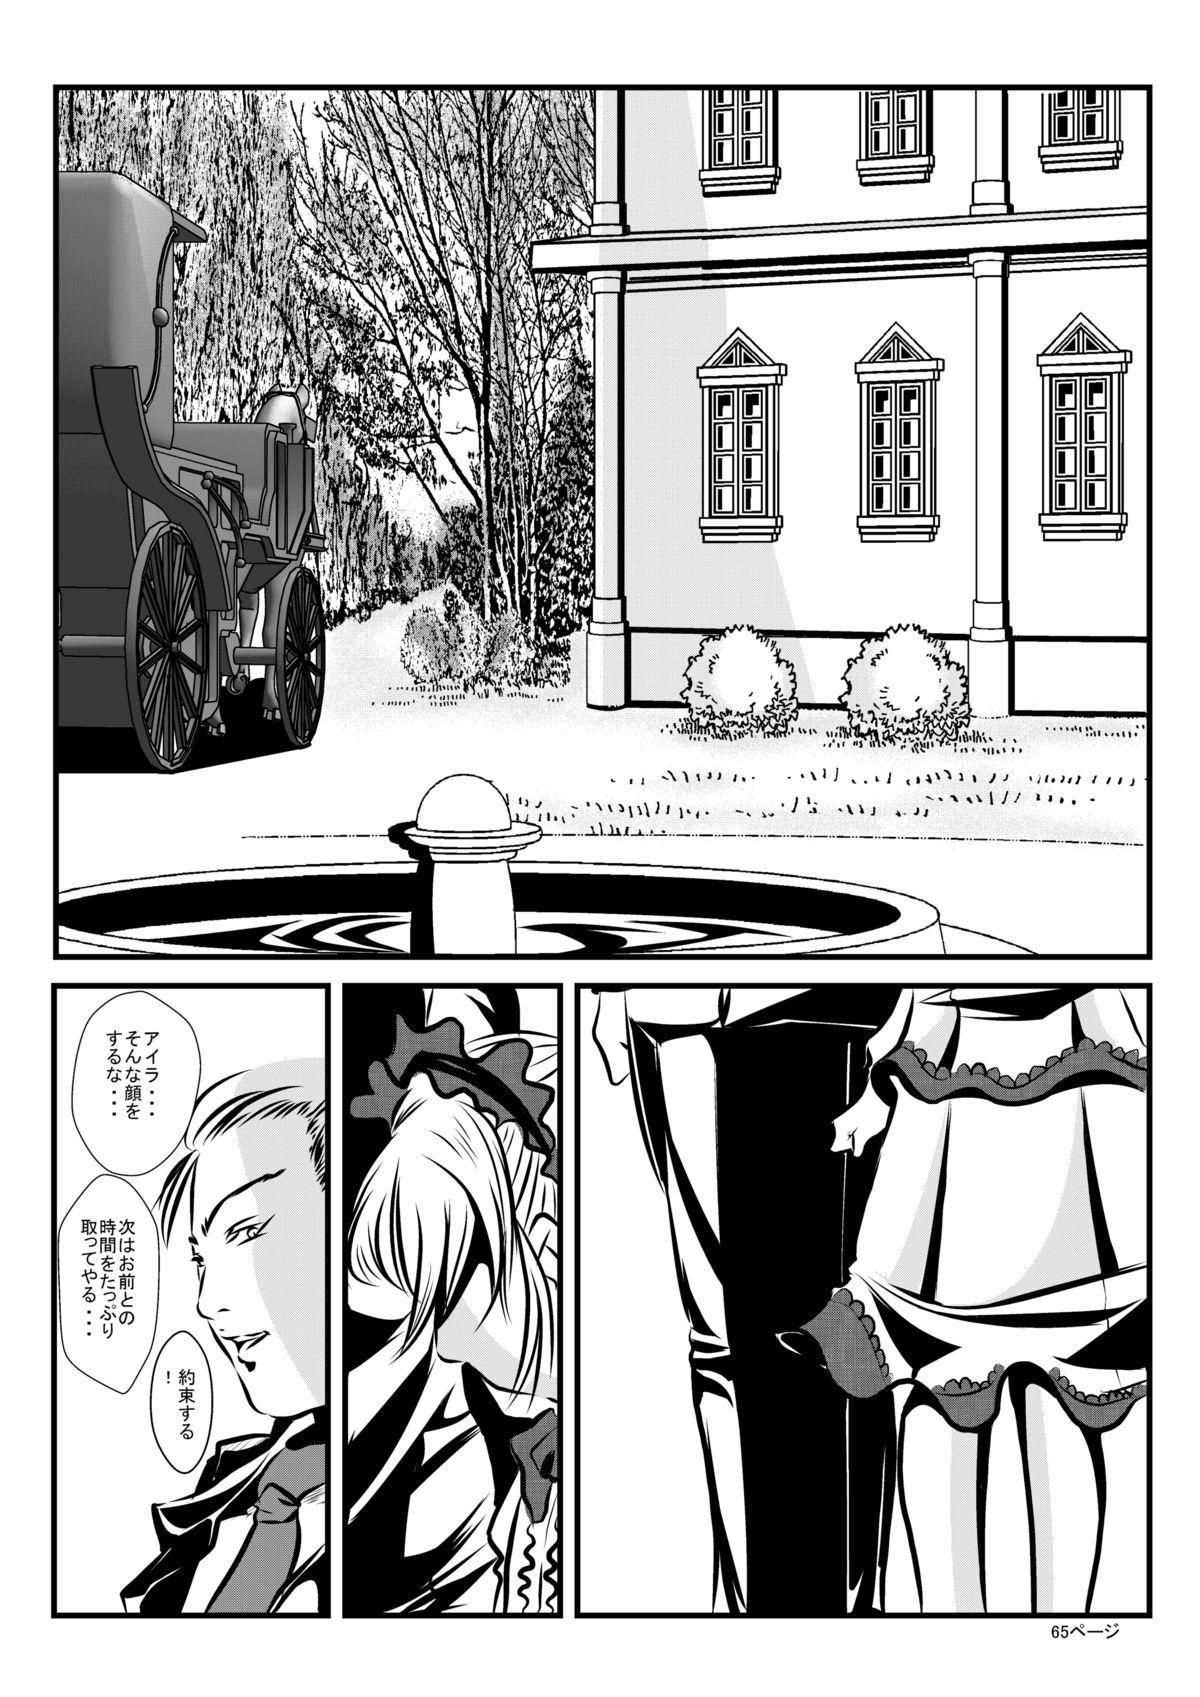 Loli Type no Jikkensitsu 63